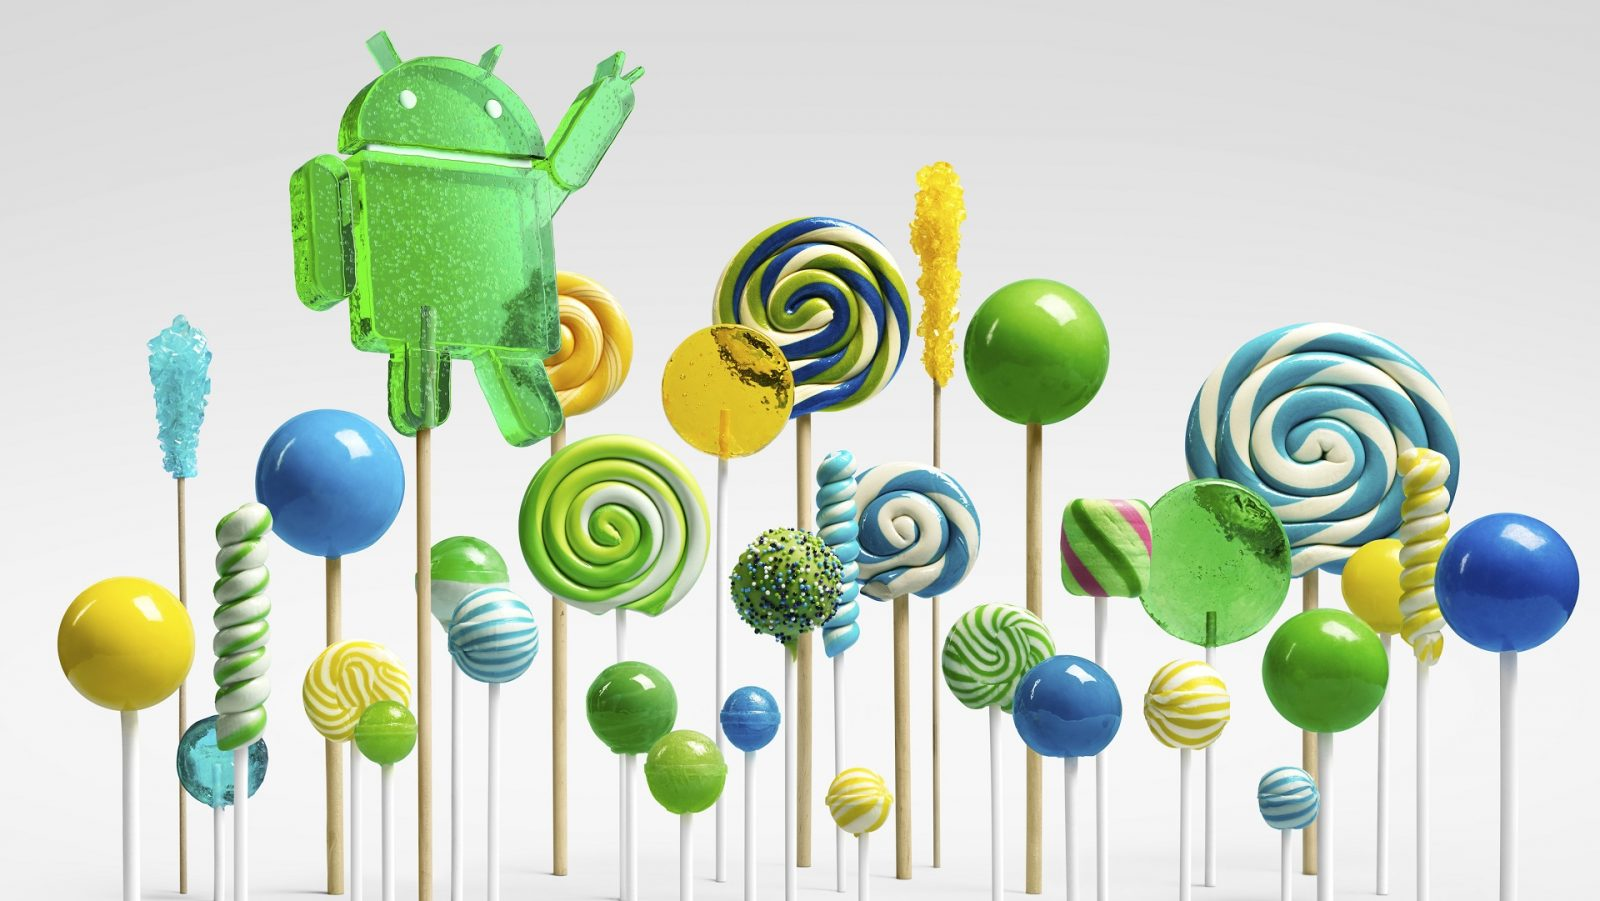 Конфета Android 5.0